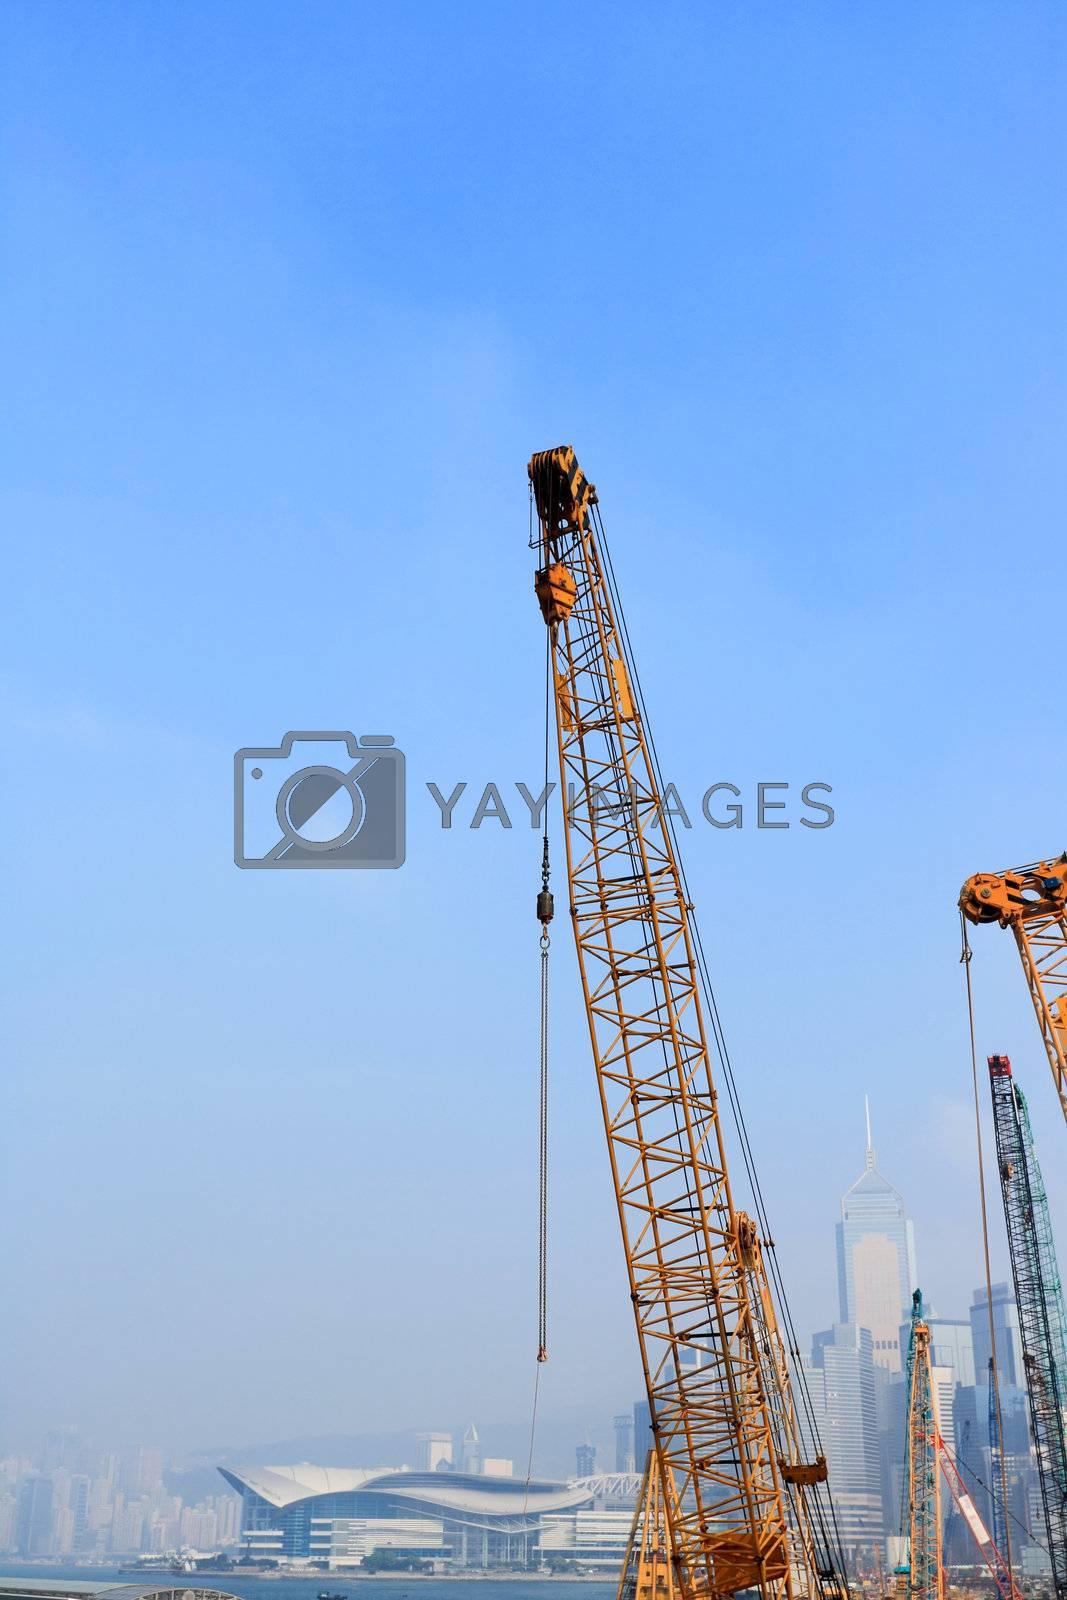 crane arm against a city background by leungchopan